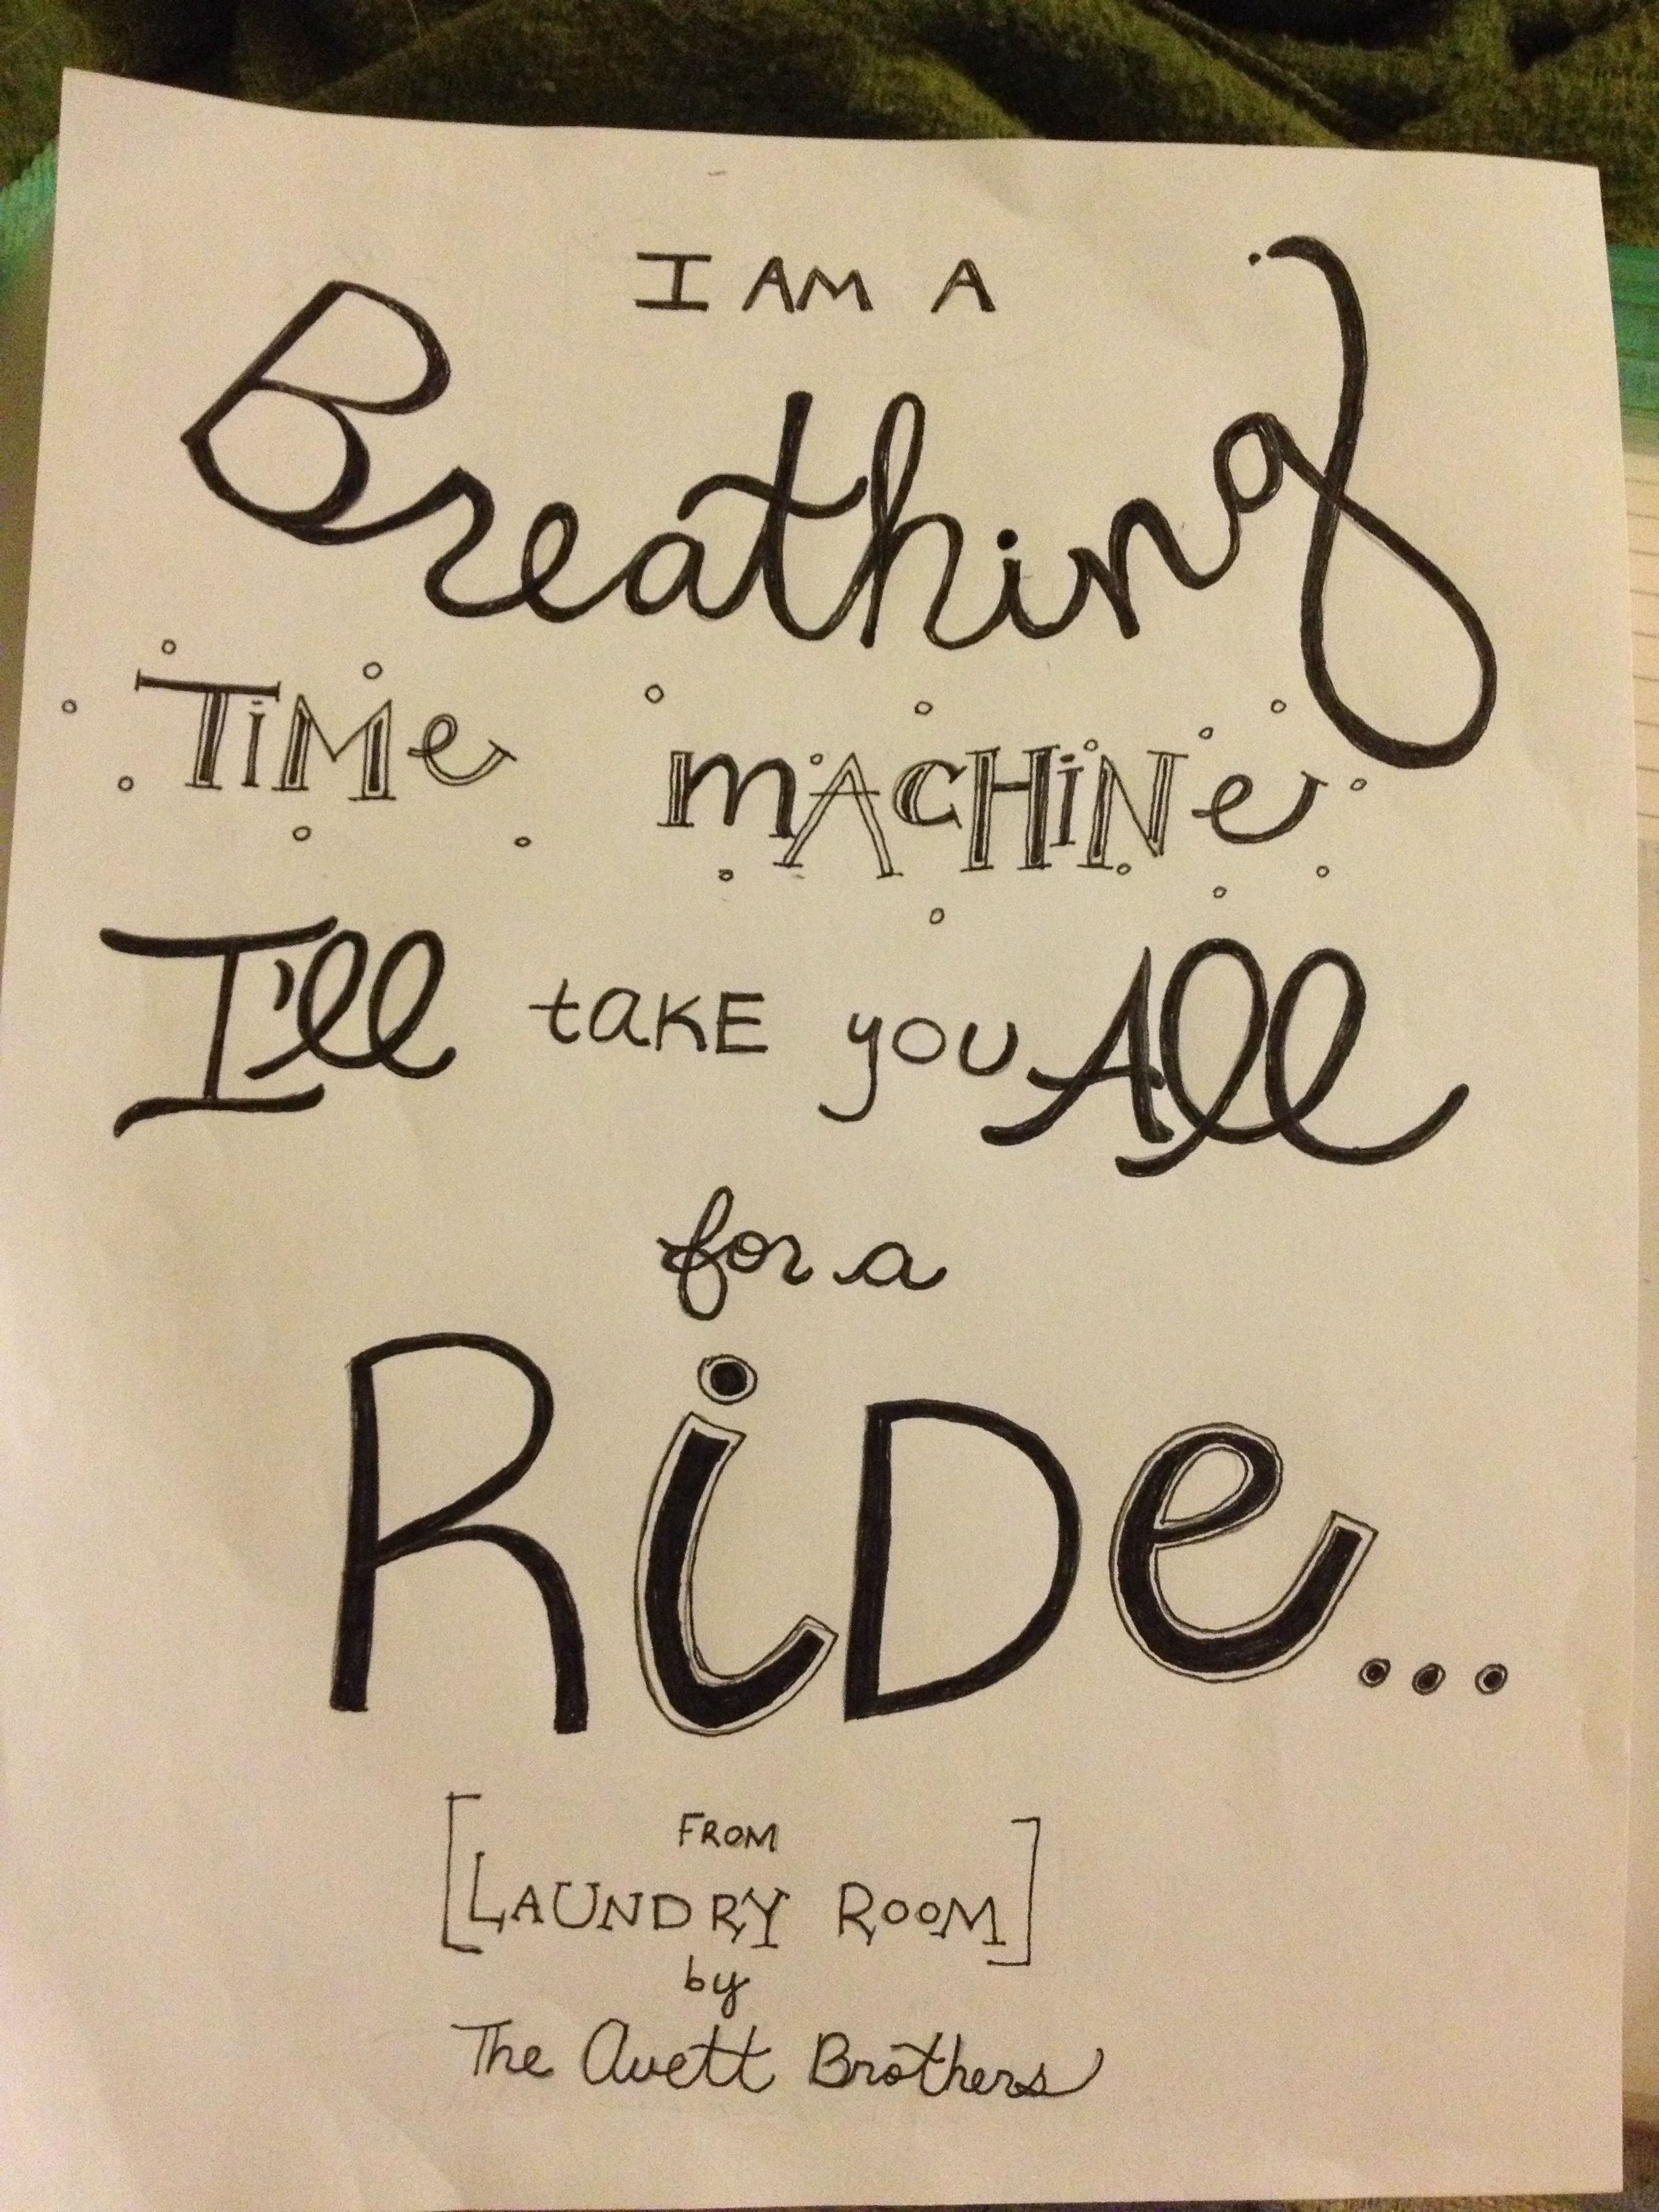 Best Kitchen Gallery: Hand Lettered Laundry Room By The Avett Brothers Hand Lettered of Laundry Room Lyrics  on rachelxblog.com